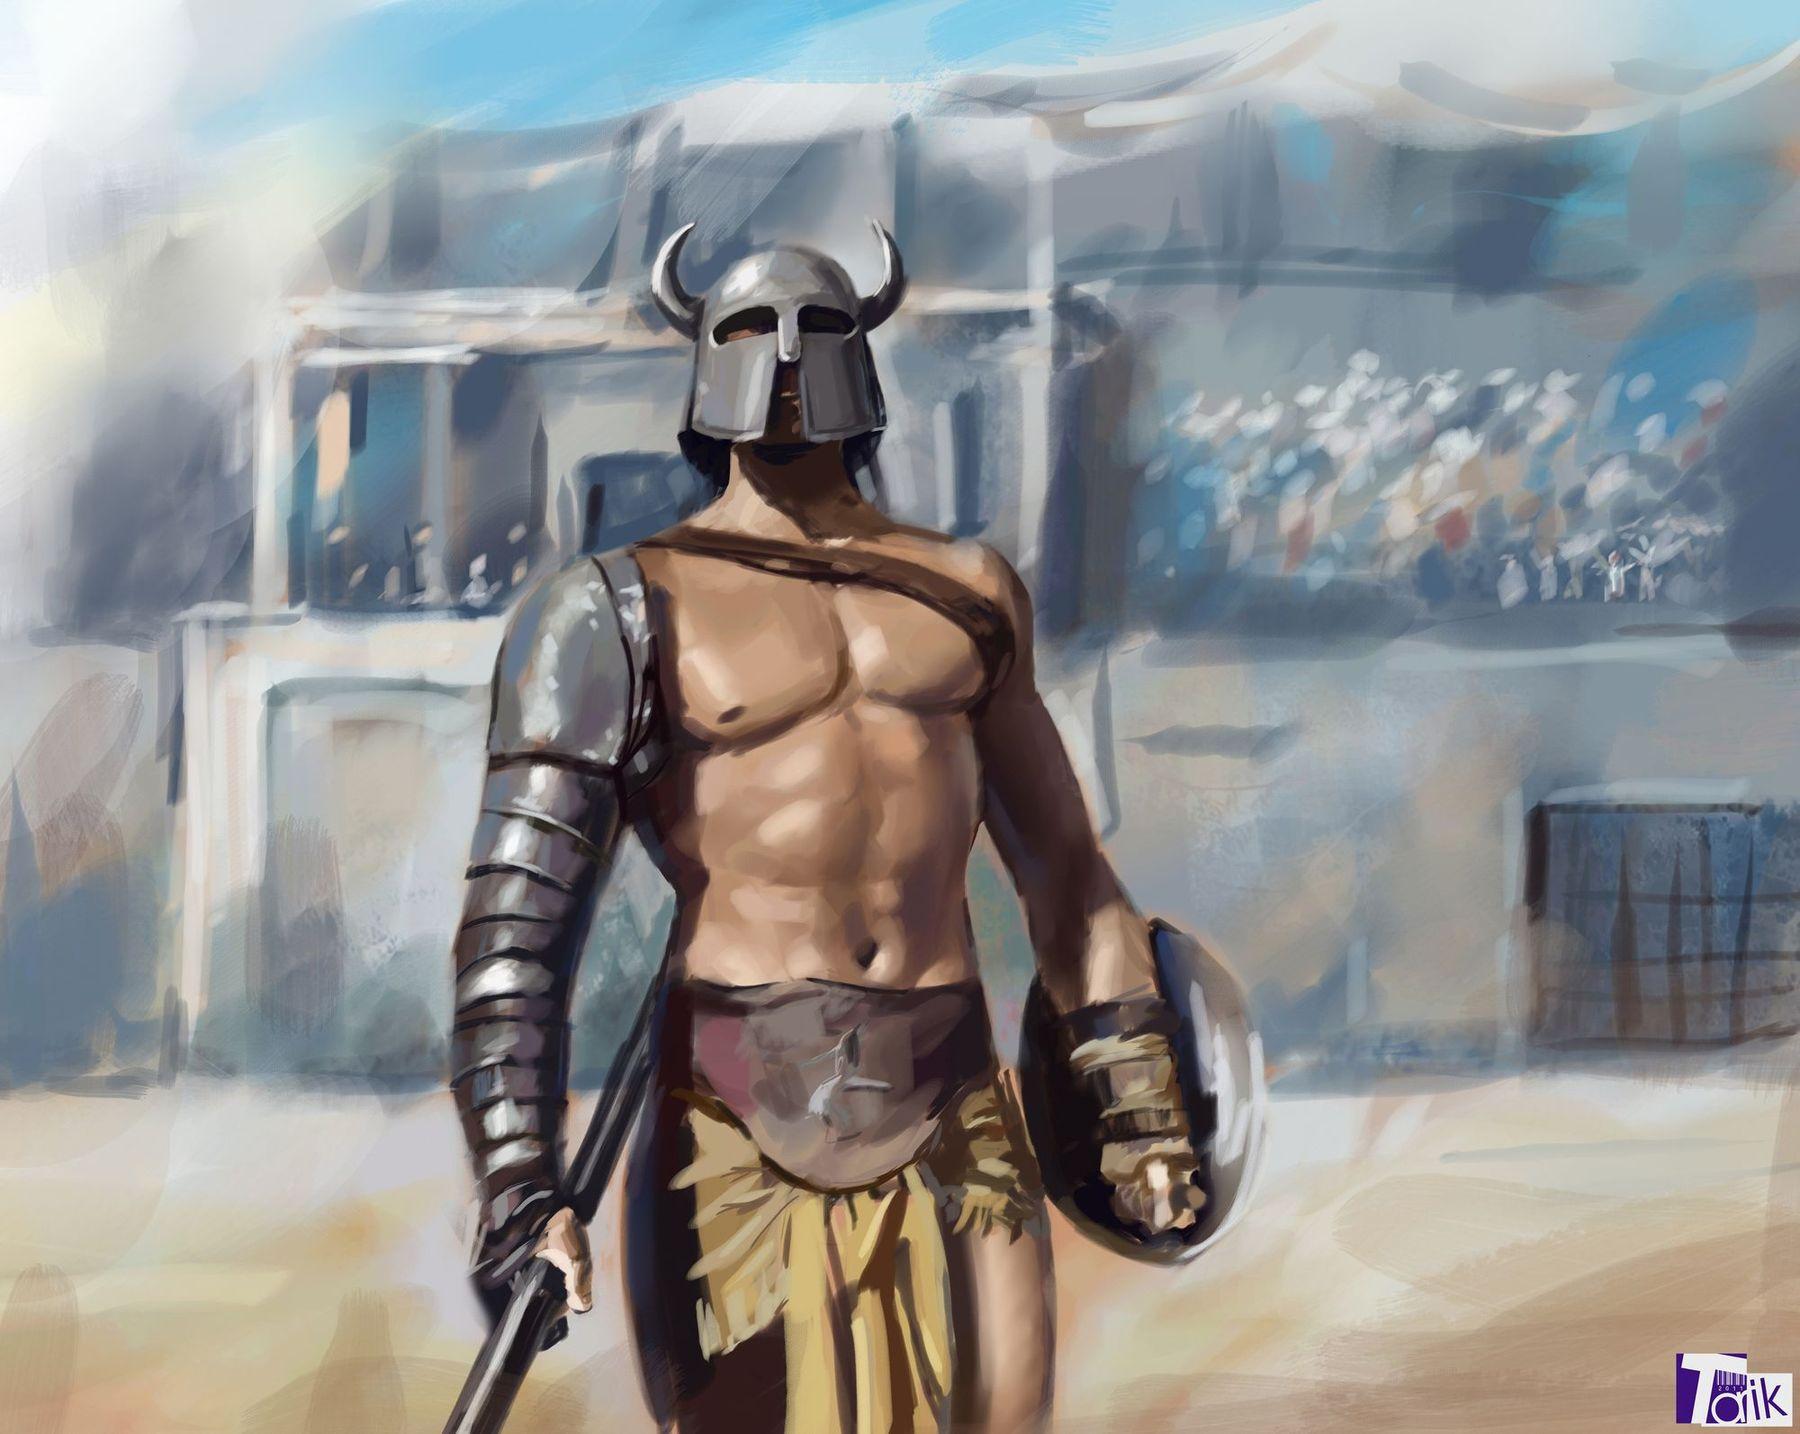 gladiator_by_tarik000-d3fsp9h.jpg